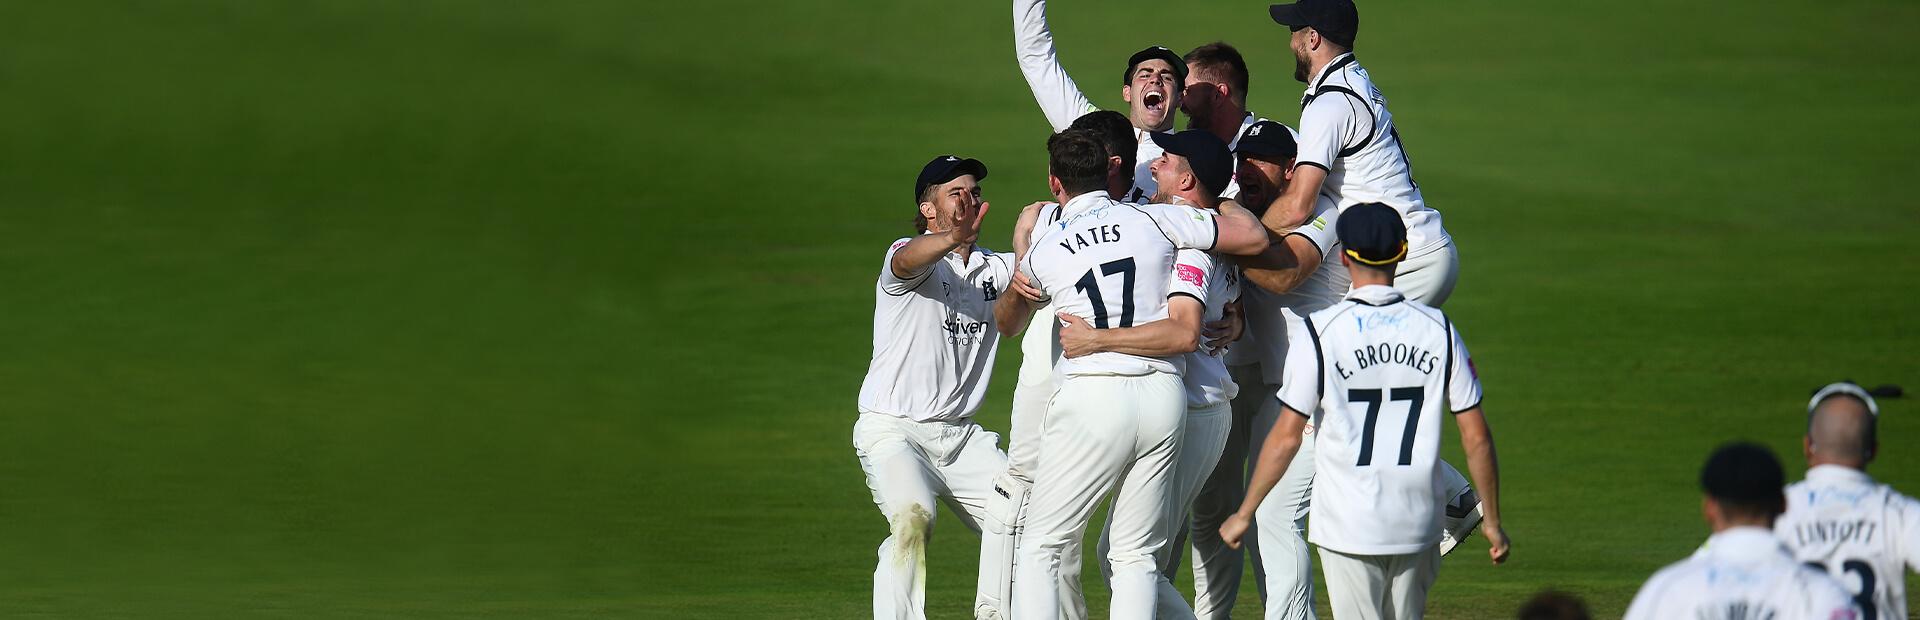 Report: Warwickshire v Somerset, LV= Insurance County Championship